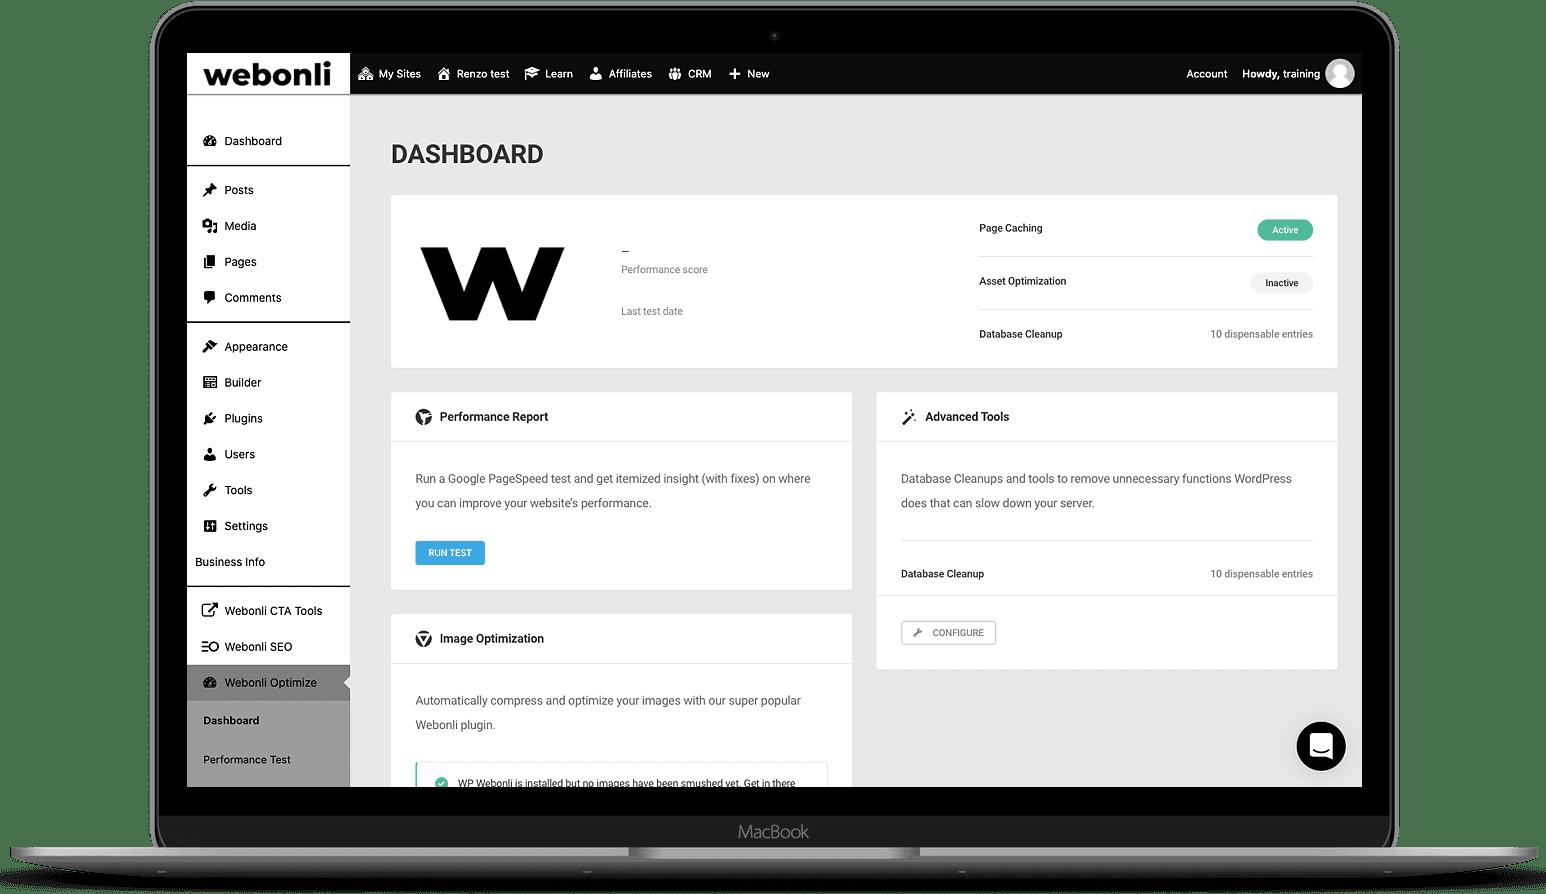 Webonli Optimize